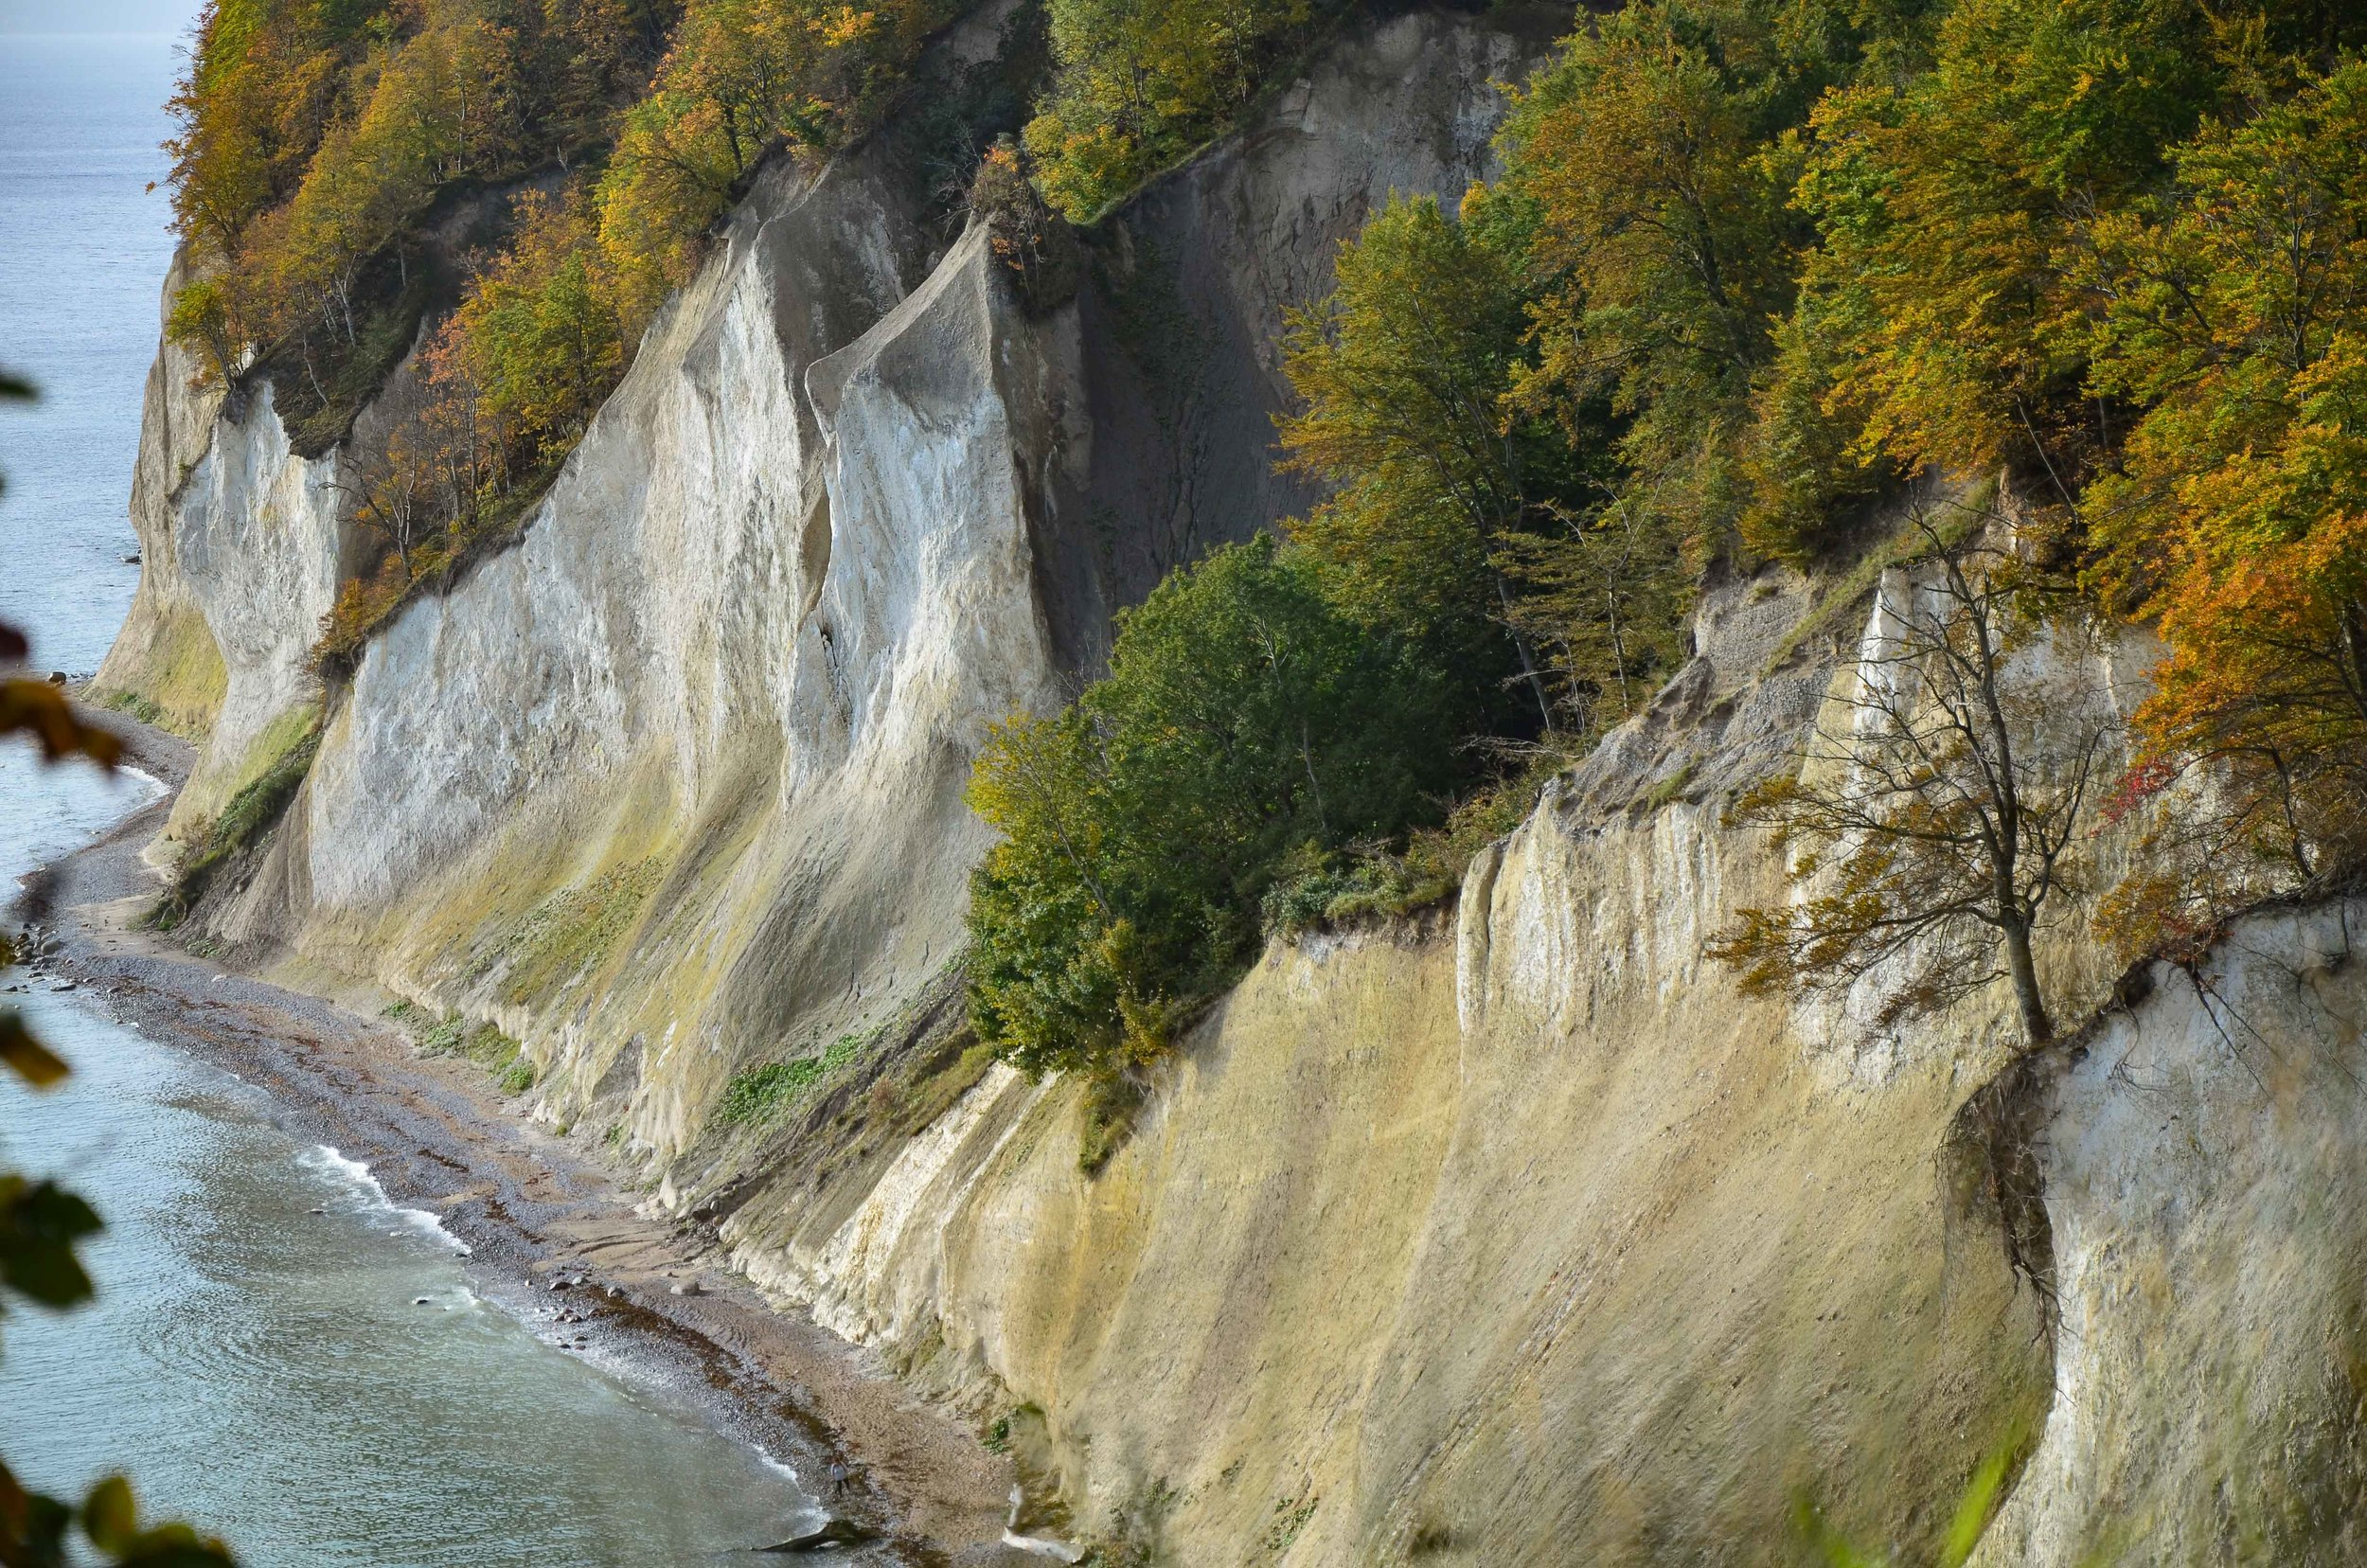 Bergwaldprojekt_Sassnitz_Ruegen_Moor_150dpi_20171014_Credits_CC-BY-SA_Jenni_Ottilie_Keppler-291.jpg